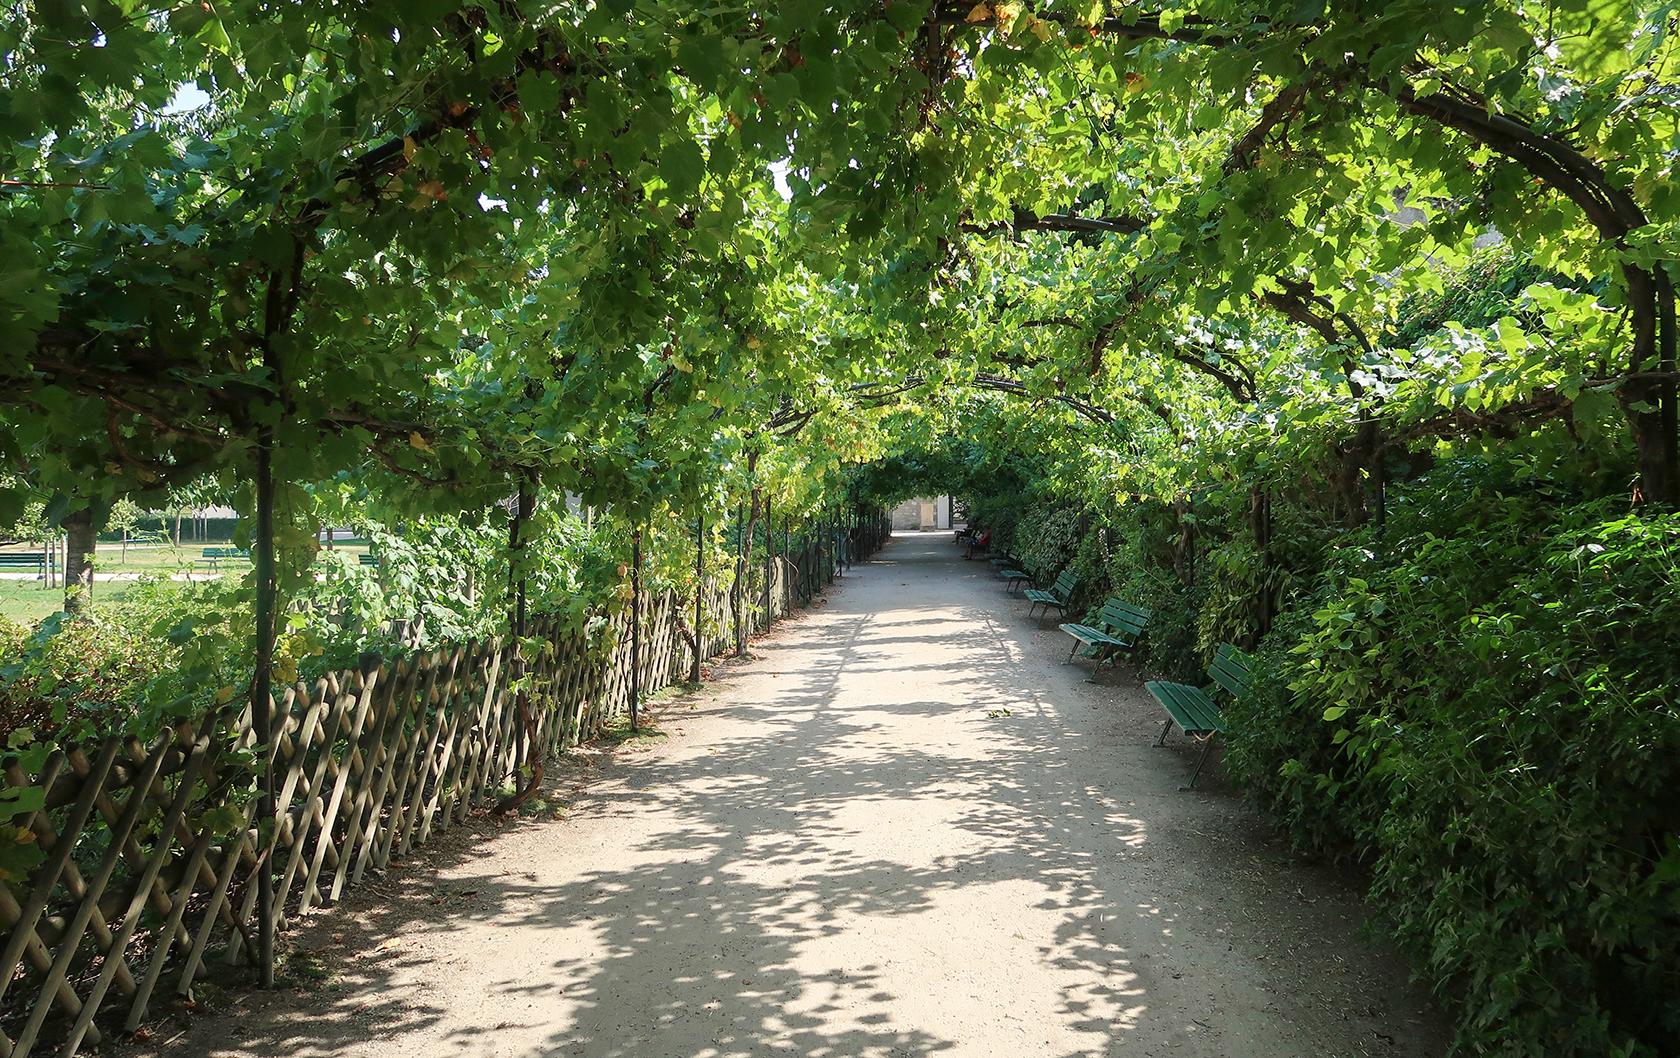 Jardin Catherine-Labouré in Paris